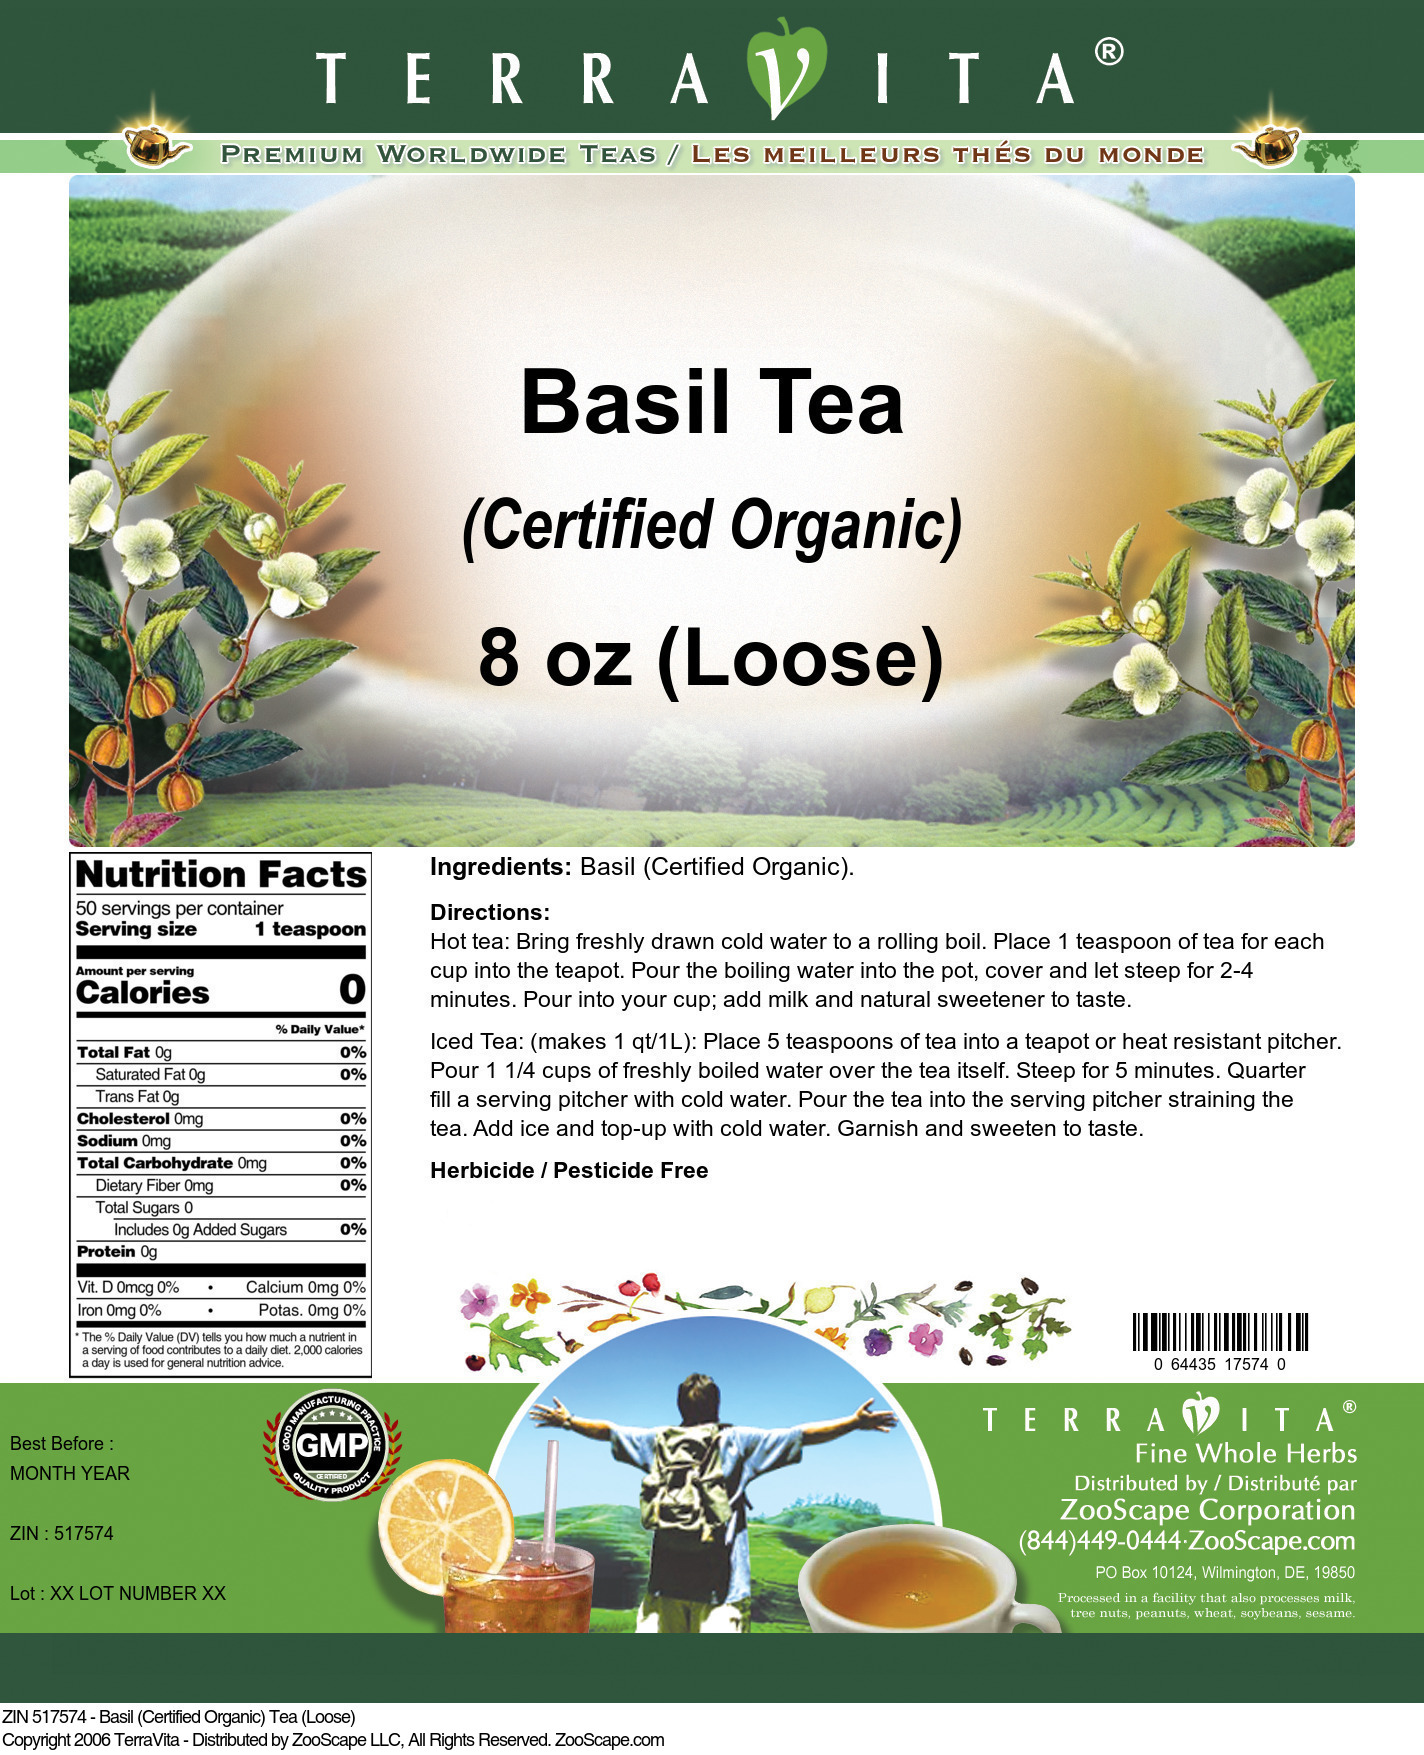 Basil (Certified Organic) Tea (Loose)